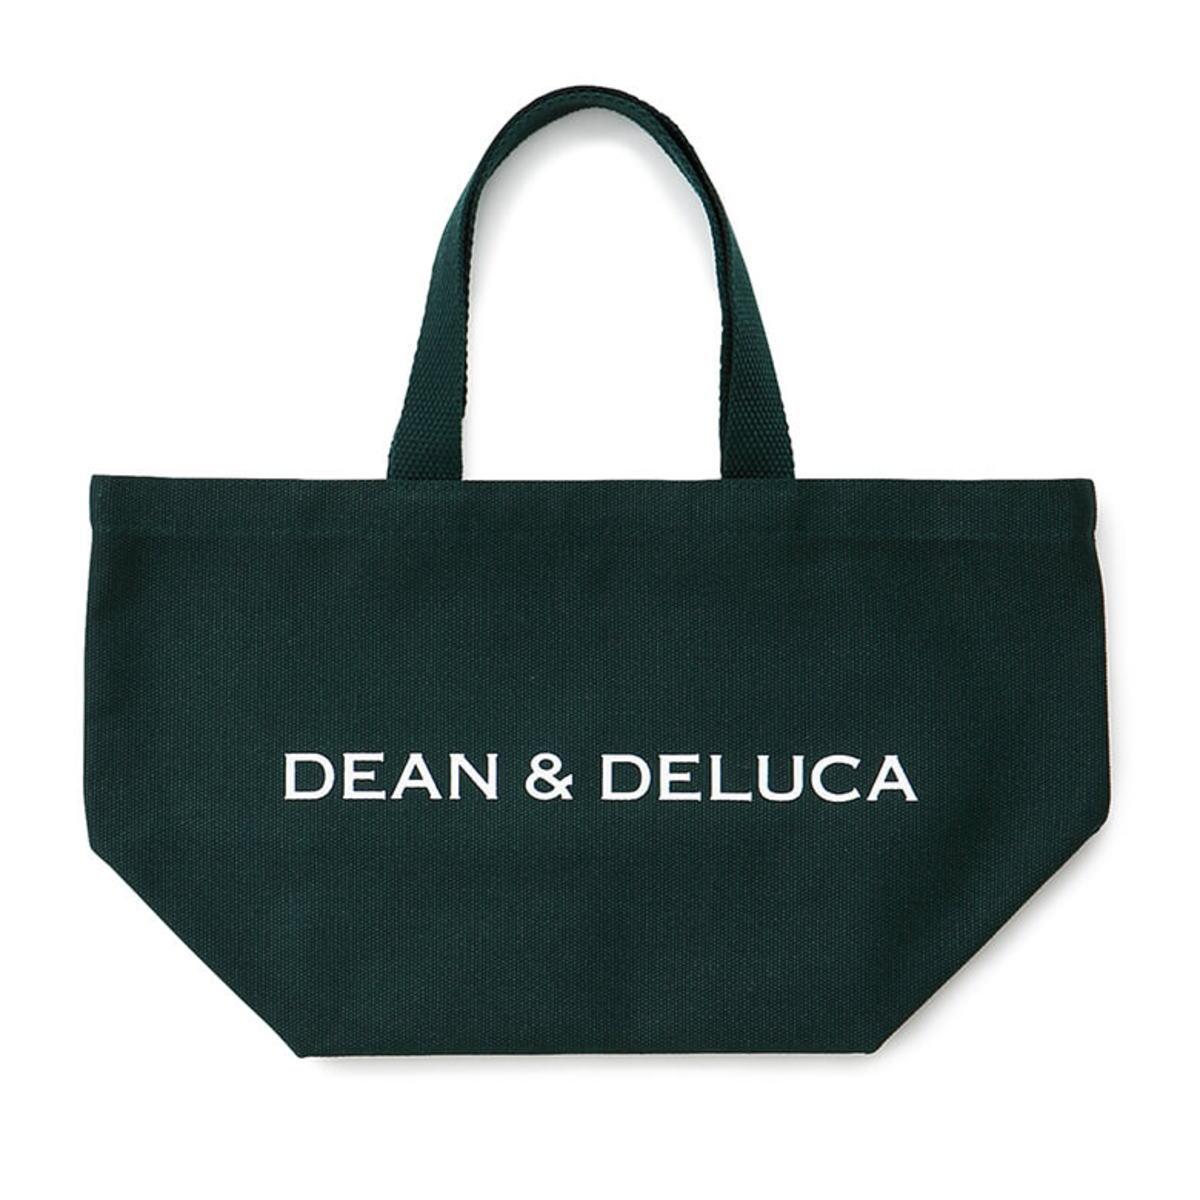 DEAN&DELUCチャリティートート2018 ダークグリーンSサイズ